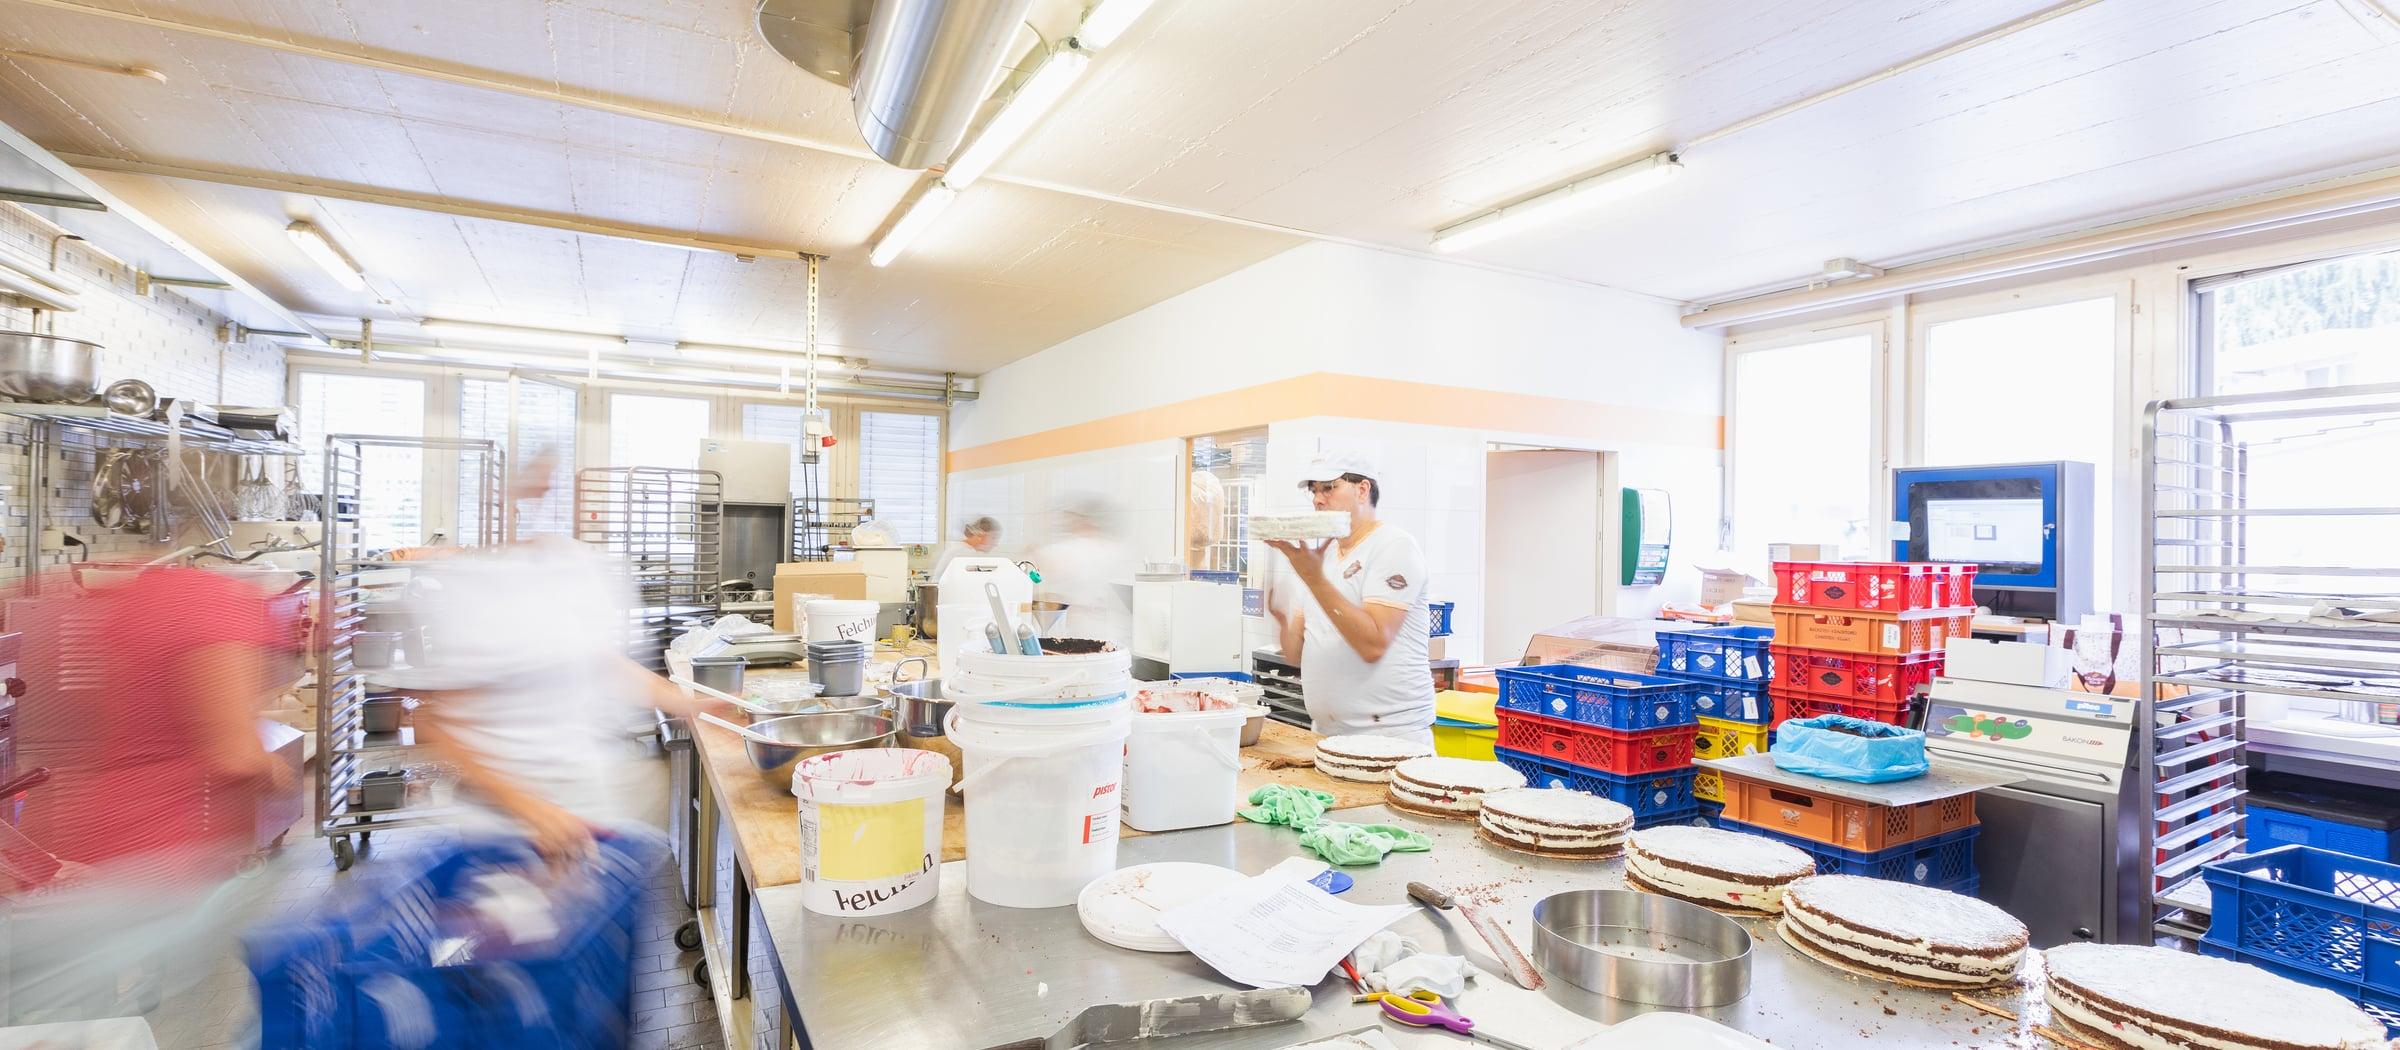 Pistor Inspiration Reportage Christen Beck Zum Beck Stansstad Bäckerei Produktion